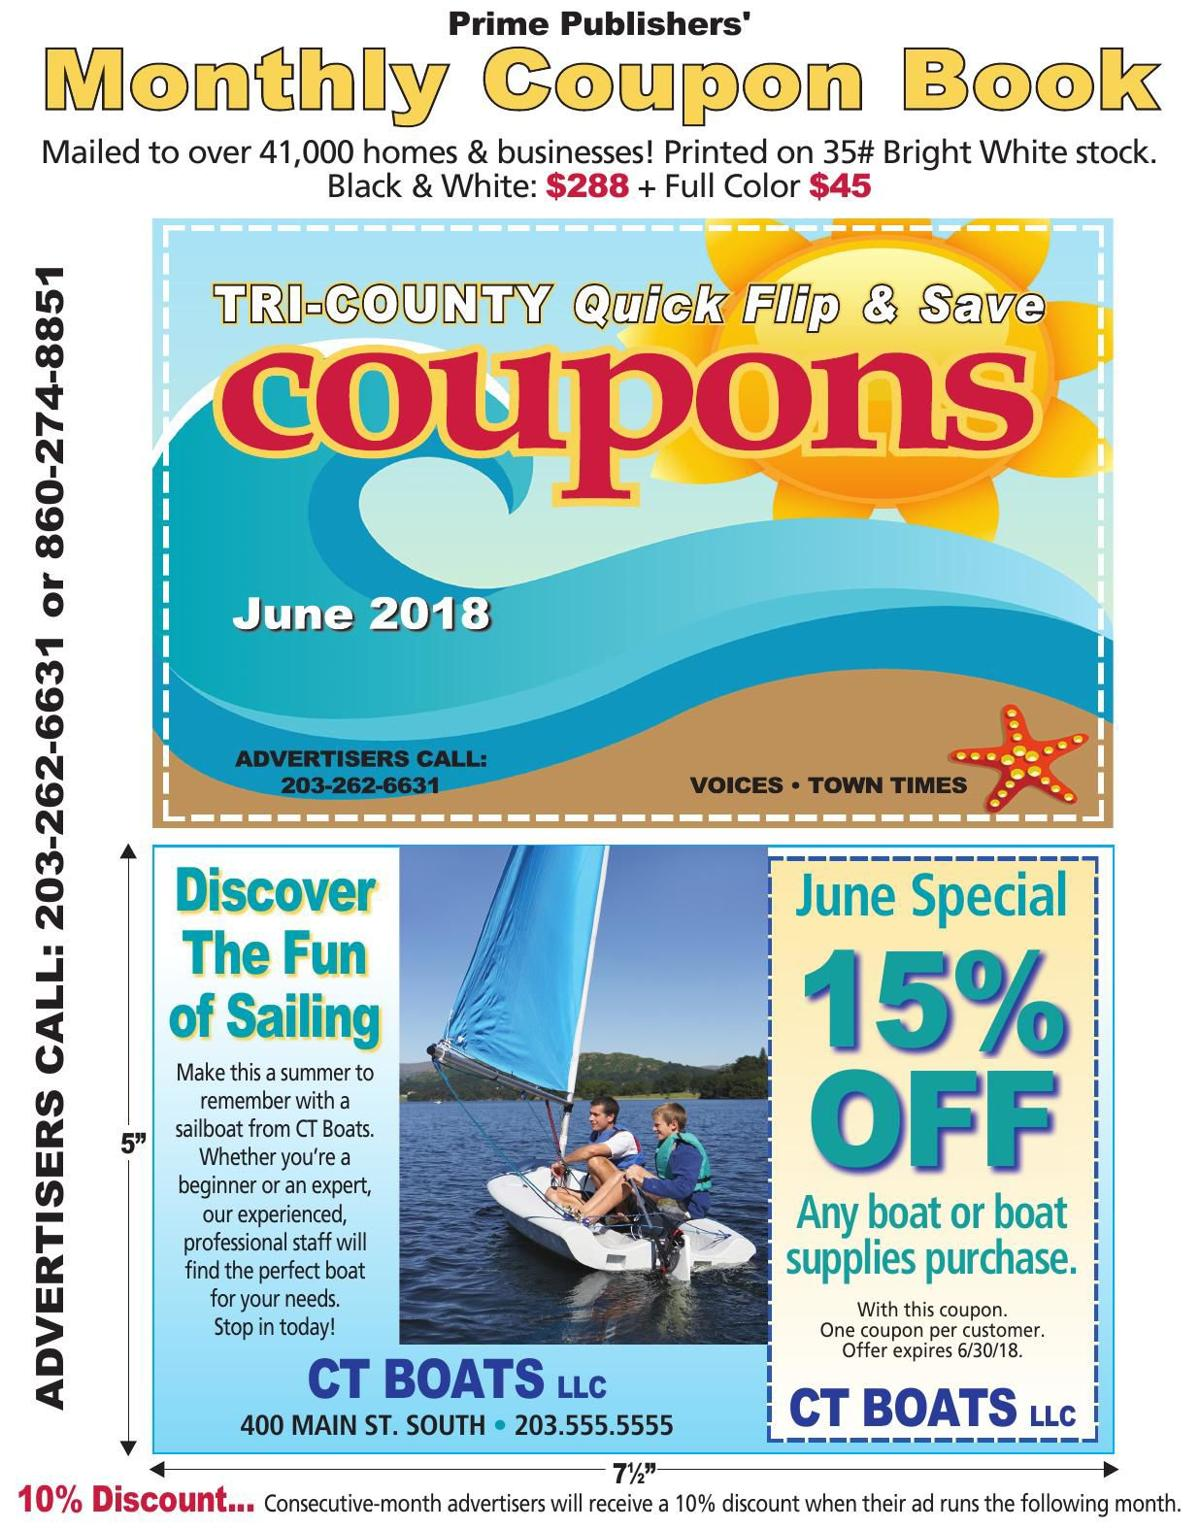 June 2018 Coupon Book